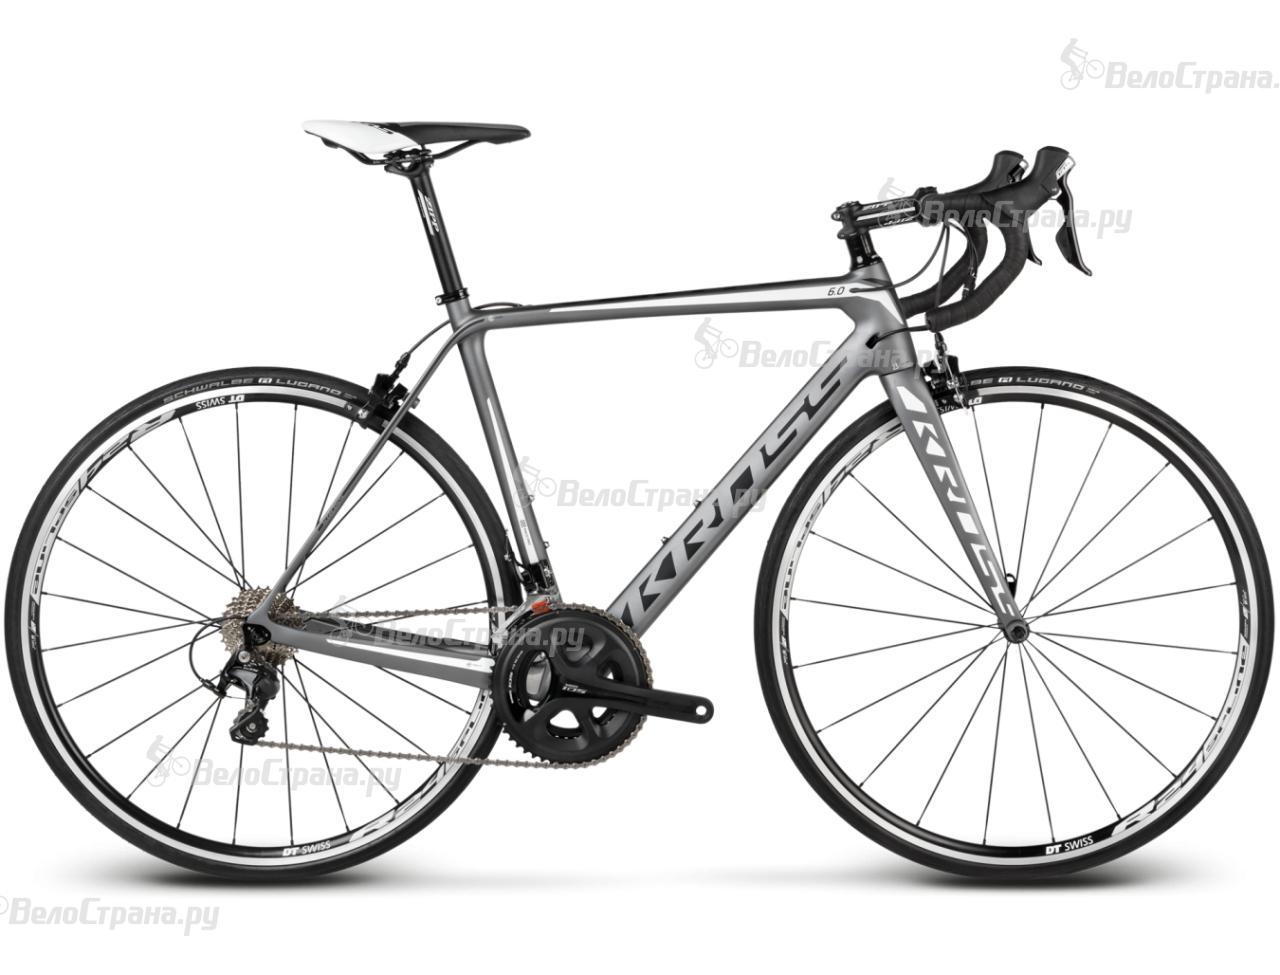 Велосипед Kross VENTO 6.0 (2017) велосипед kross vento 6 0 2017